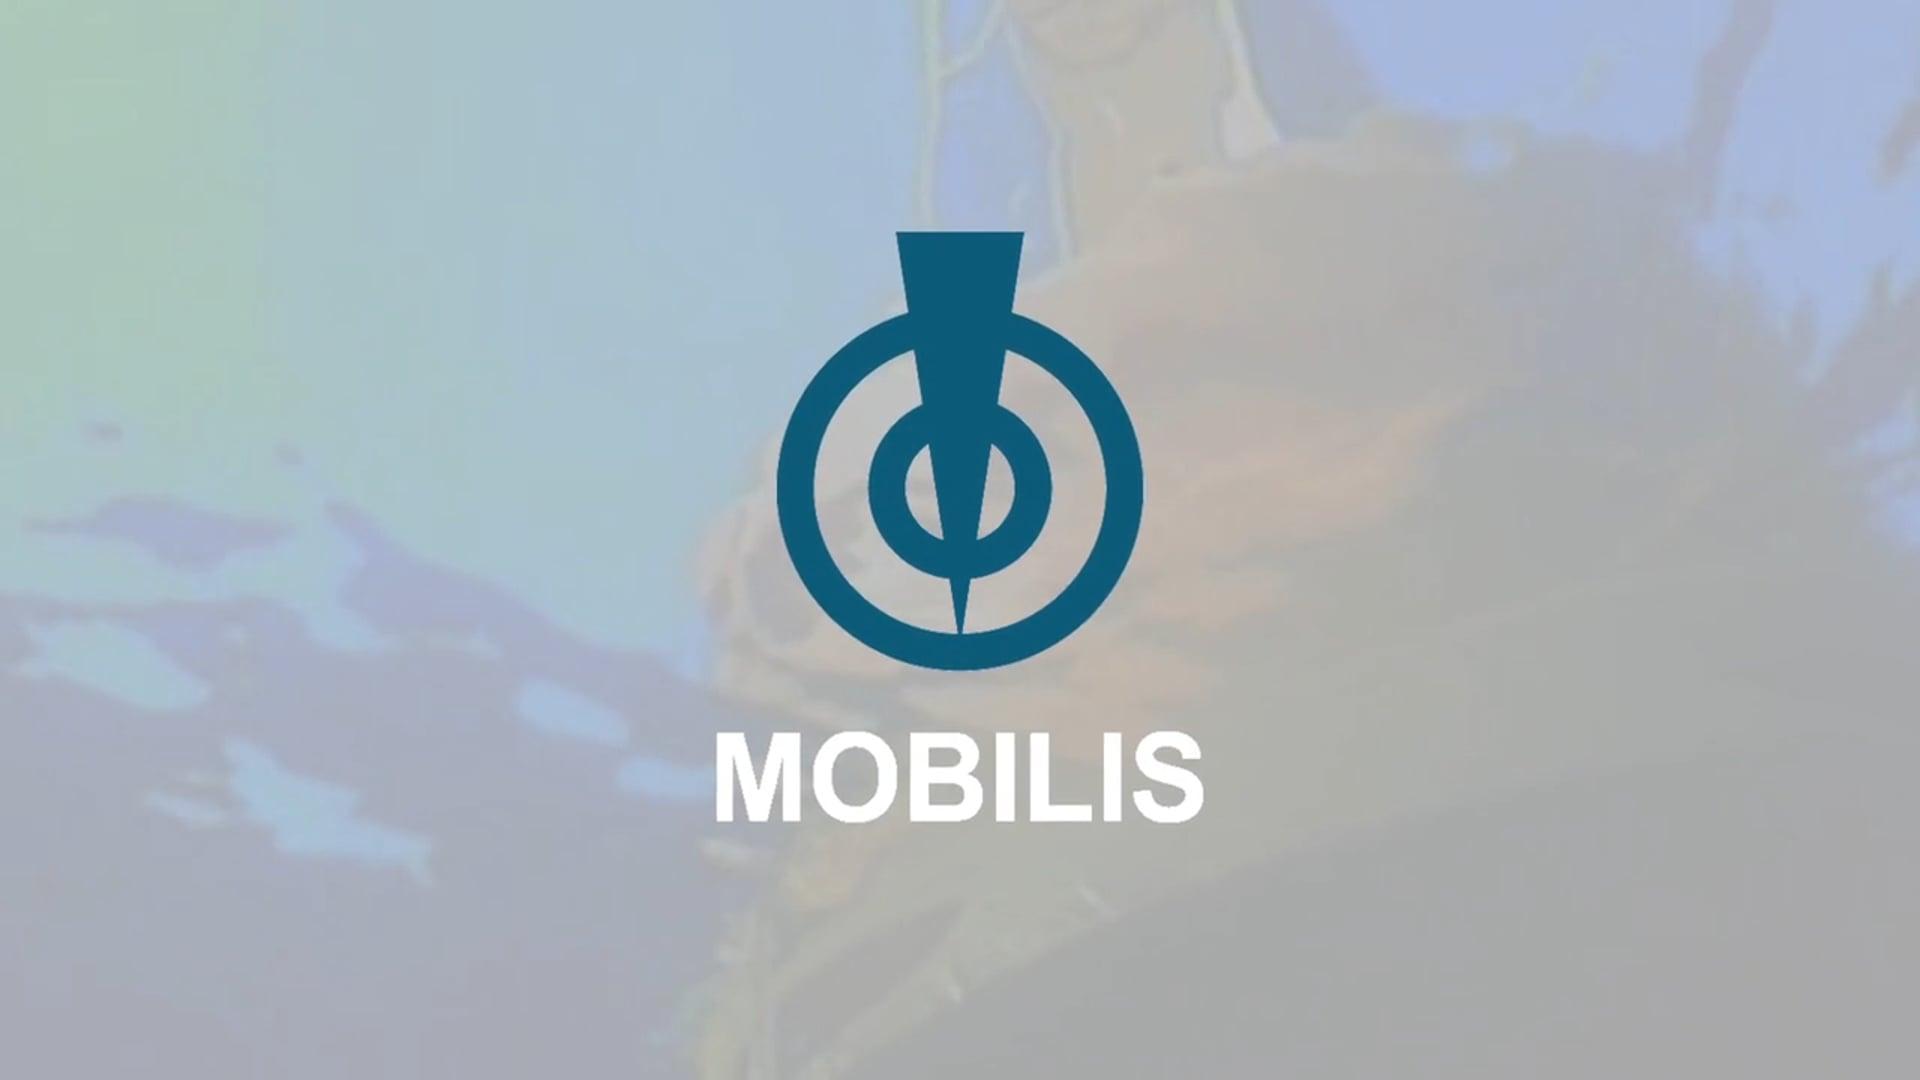 VIDEO COMMUNICATION - MOBILIS